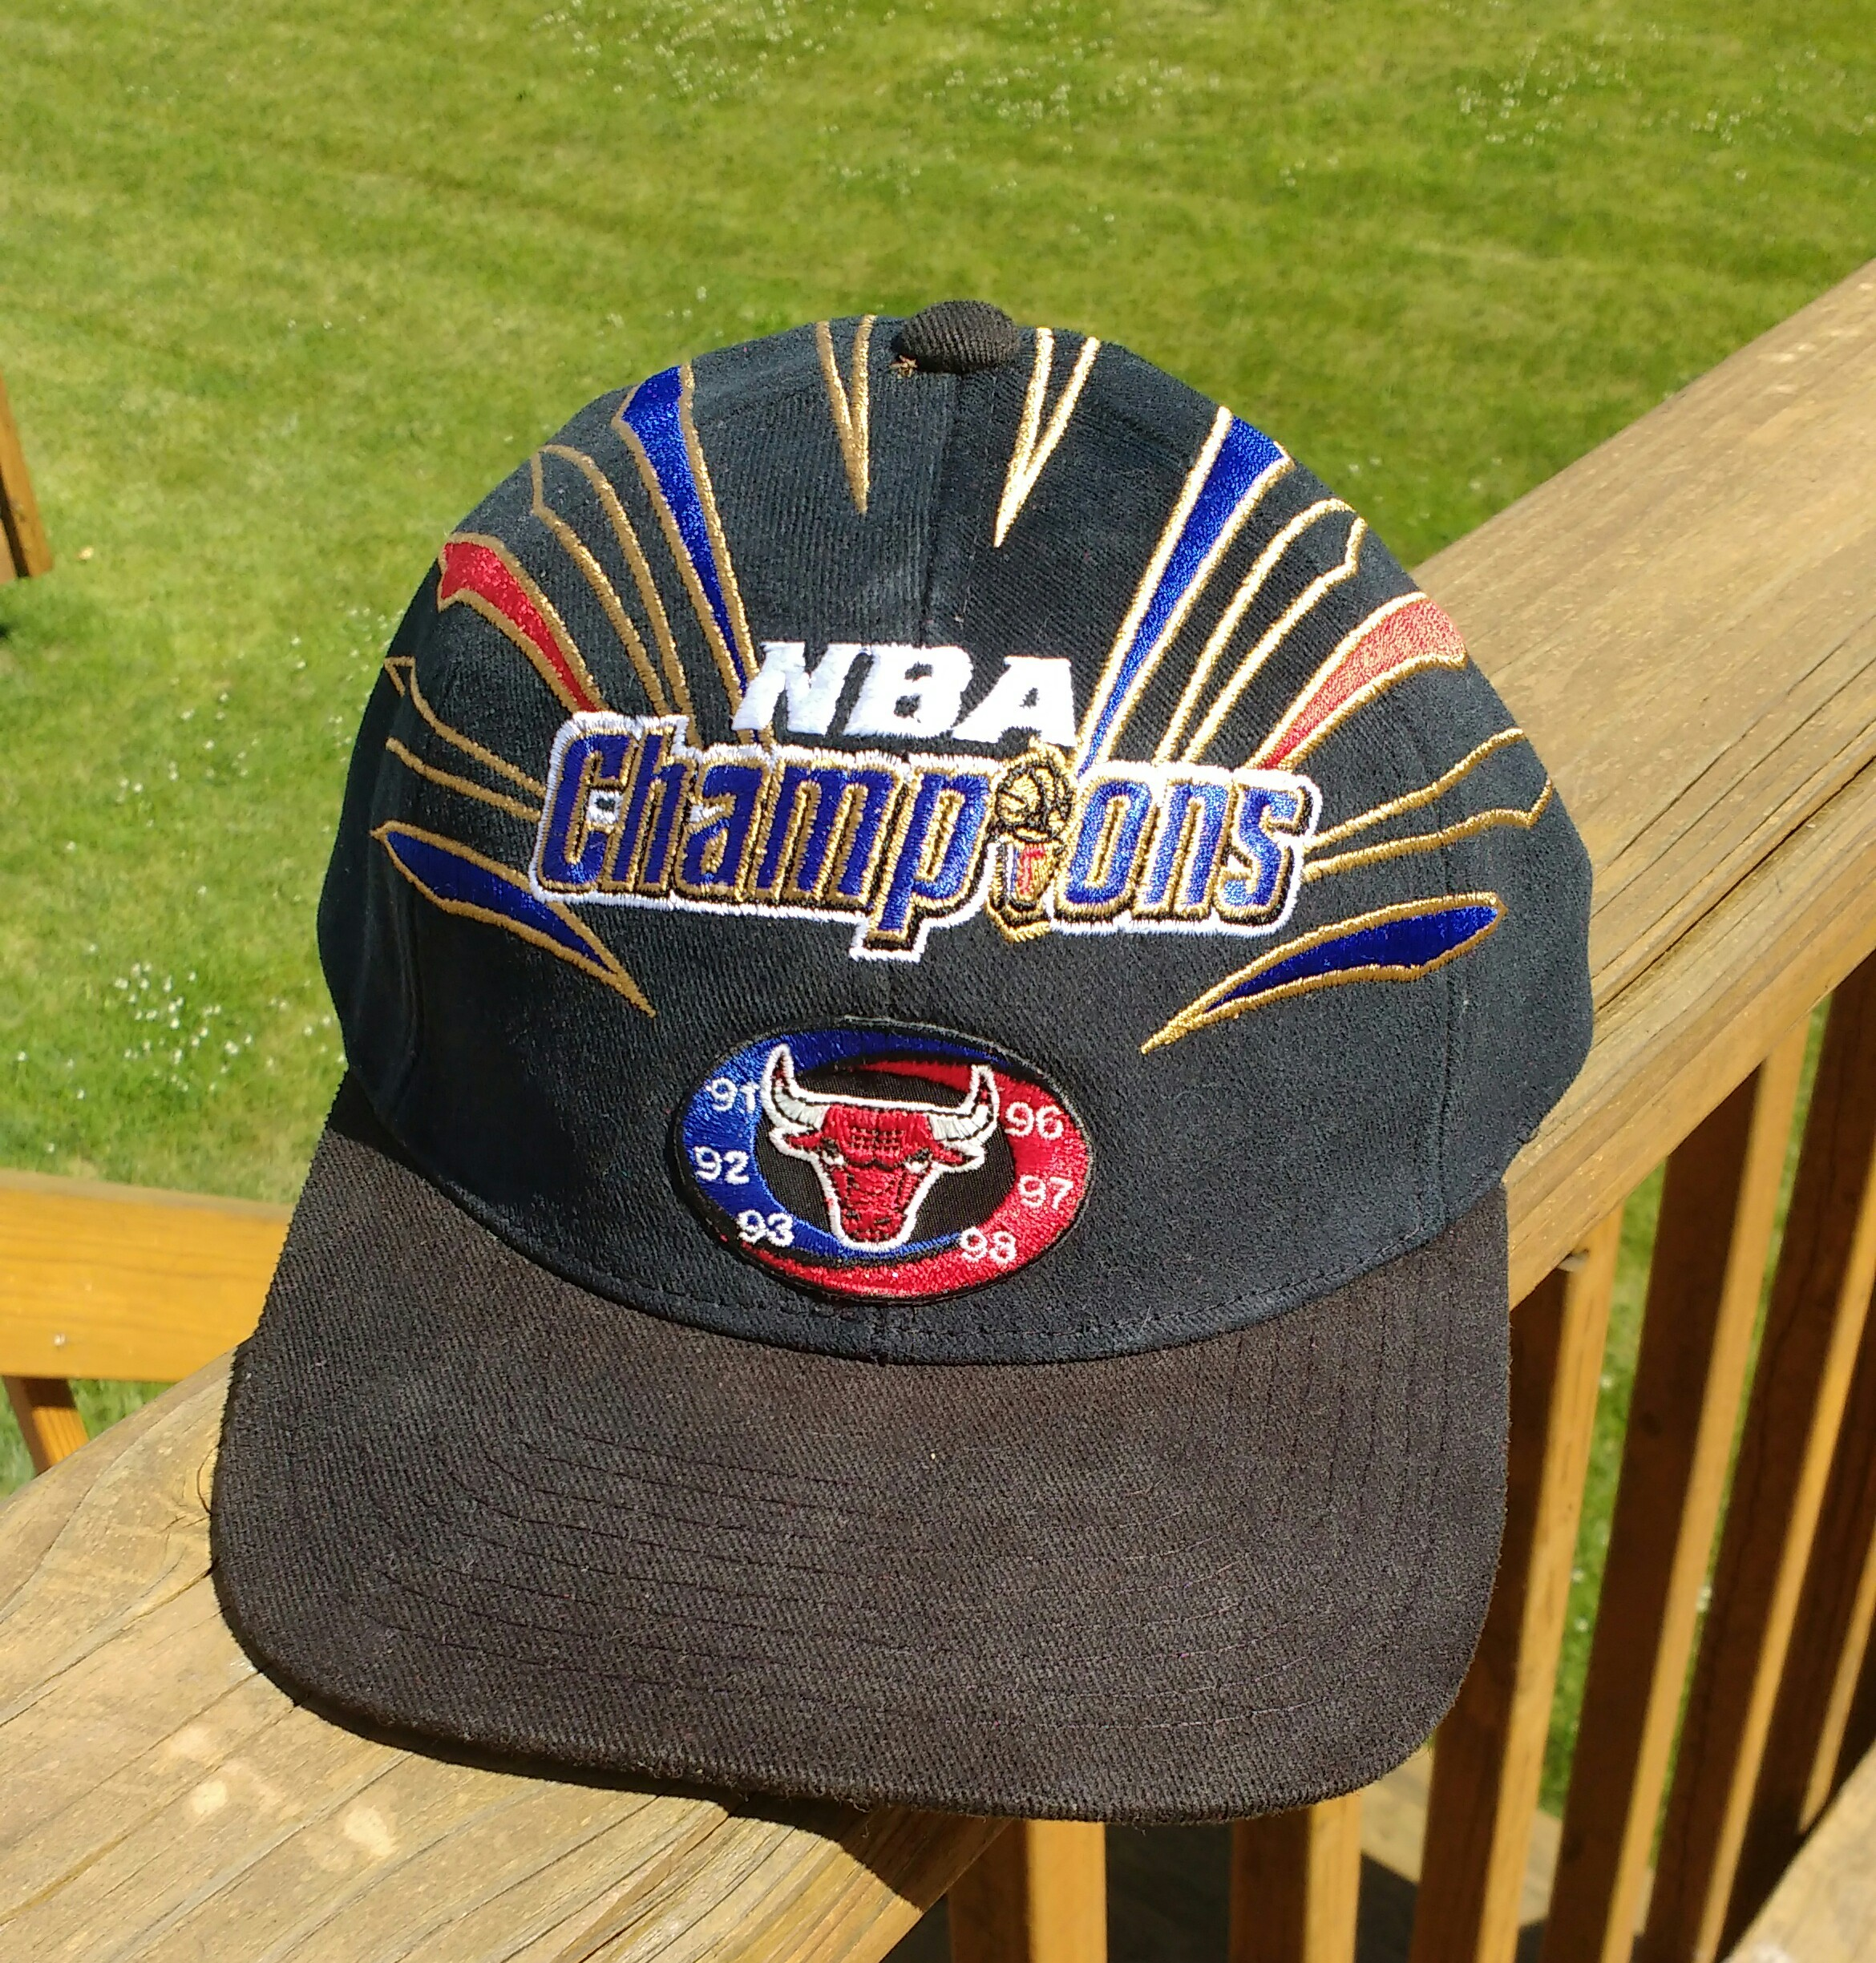 eda39f75510 Vintage 1998 Chicago Bulls Championship Hat By Starter on Storenvy